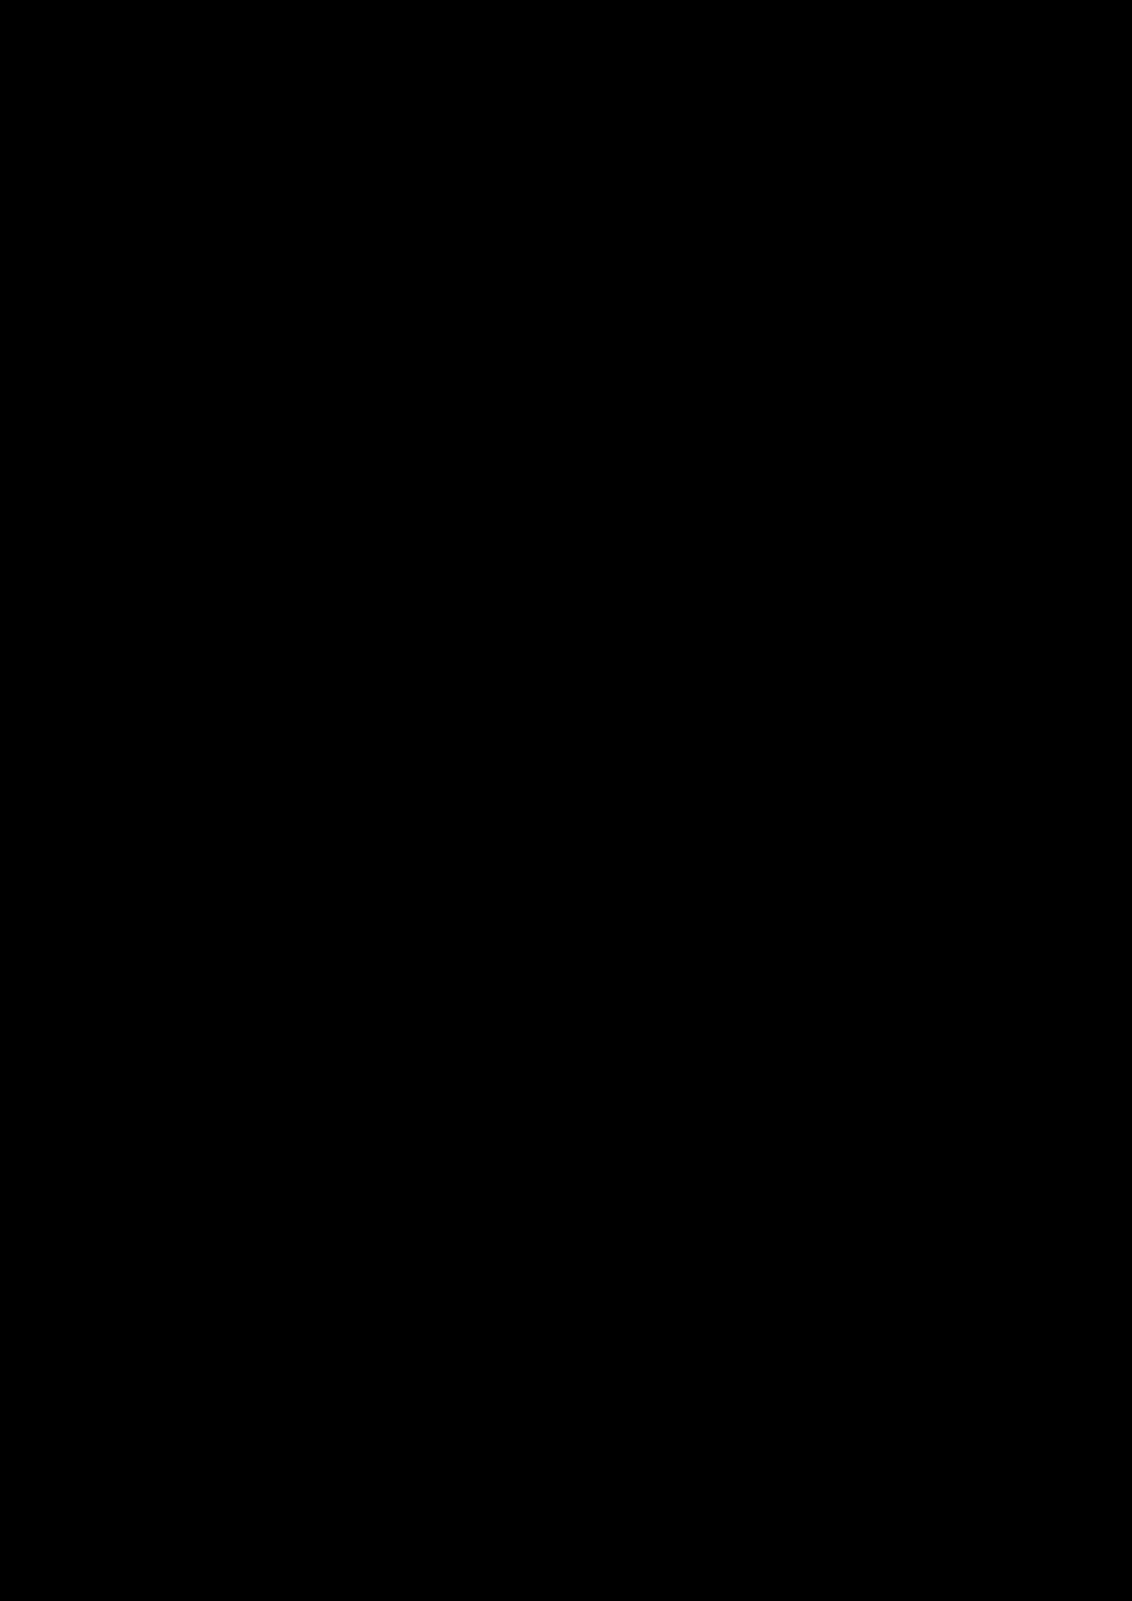 Okean Pustotyi slide, Image 3